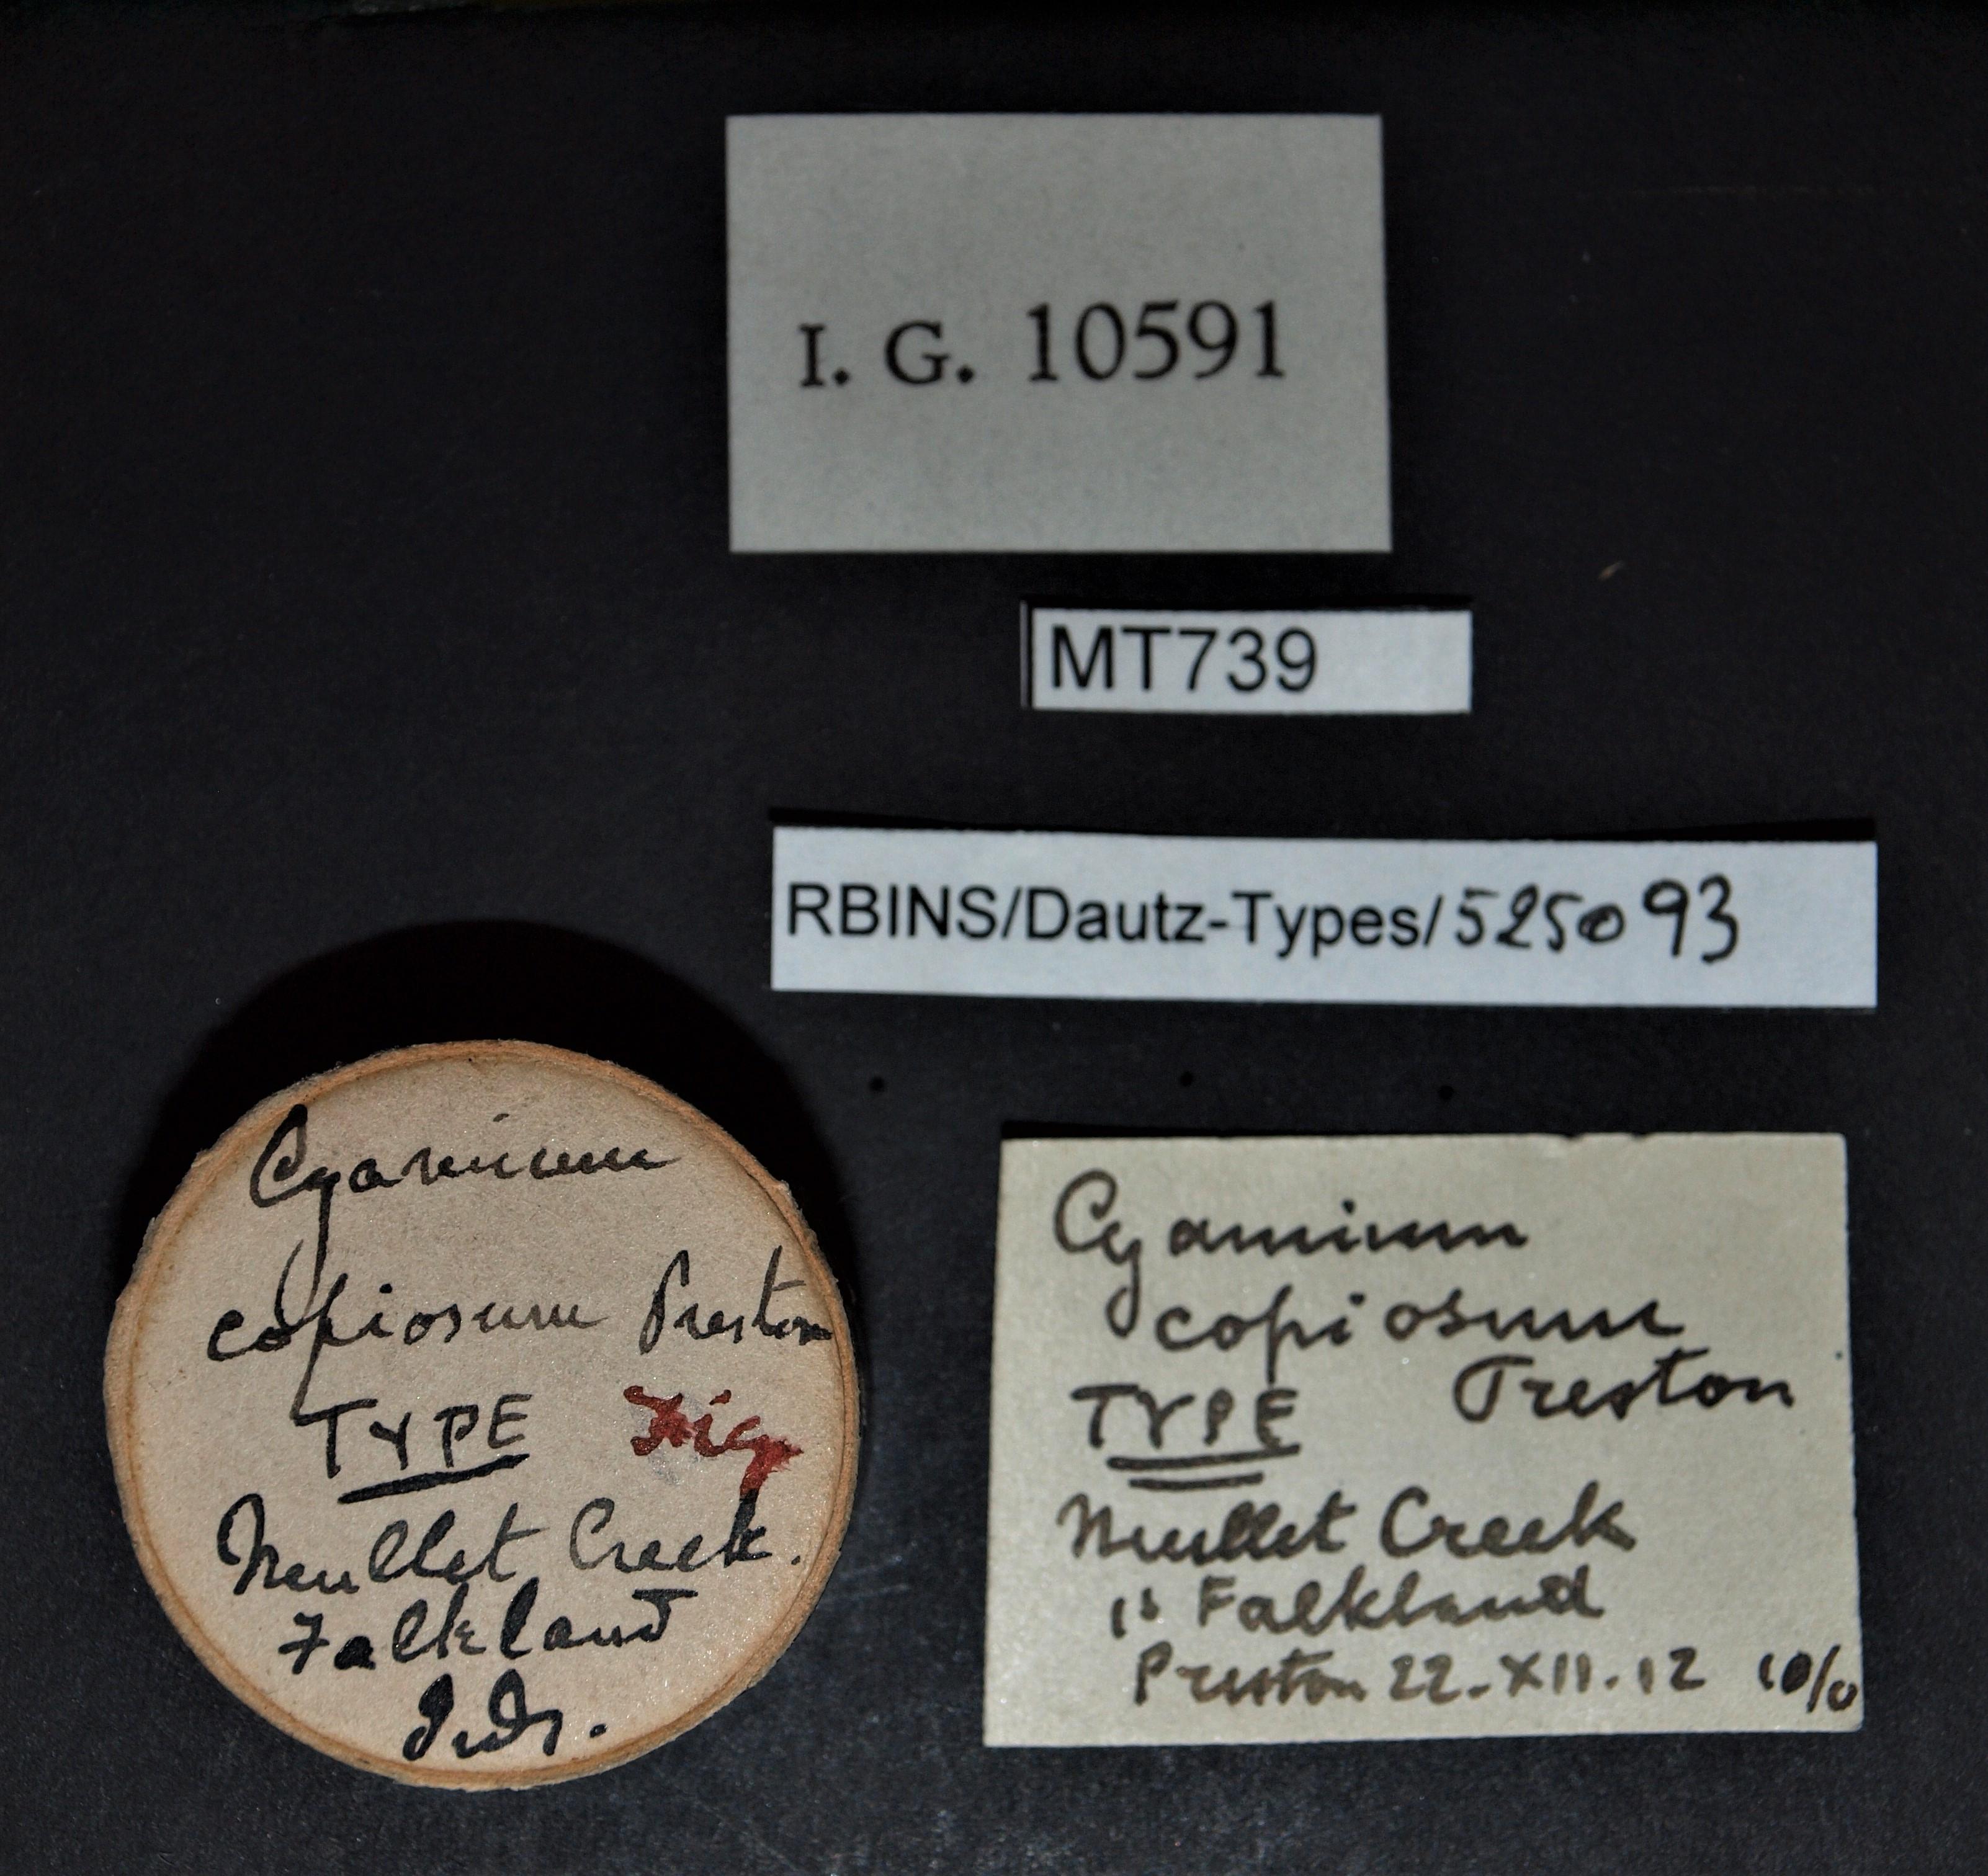 Cyamium copiosum t.JPG